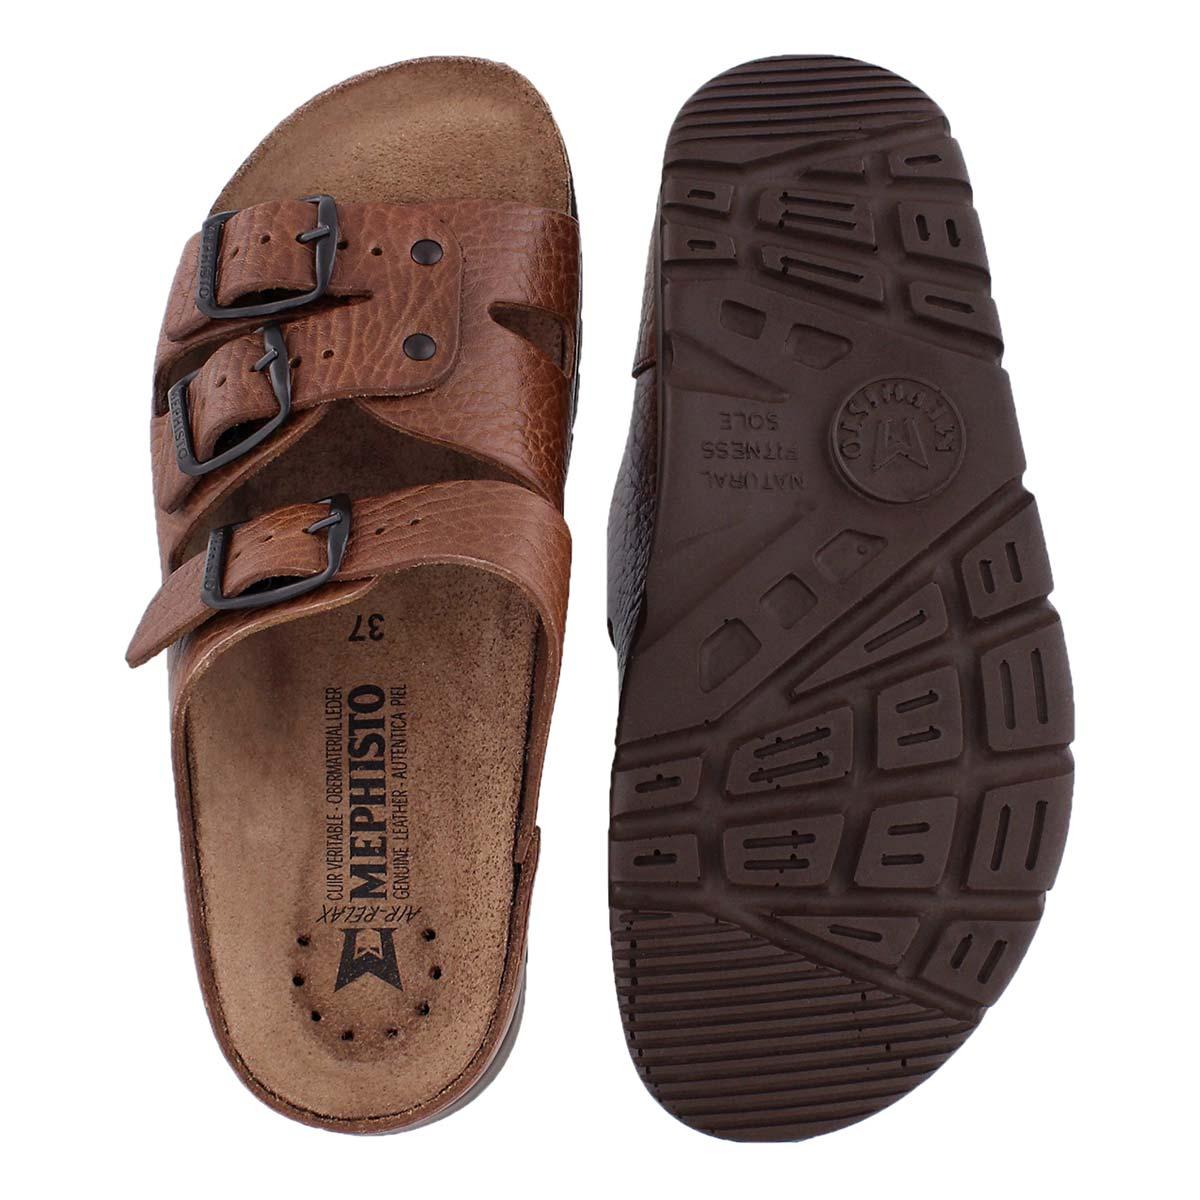 Lds Zach buffalo brn cork footbed slide